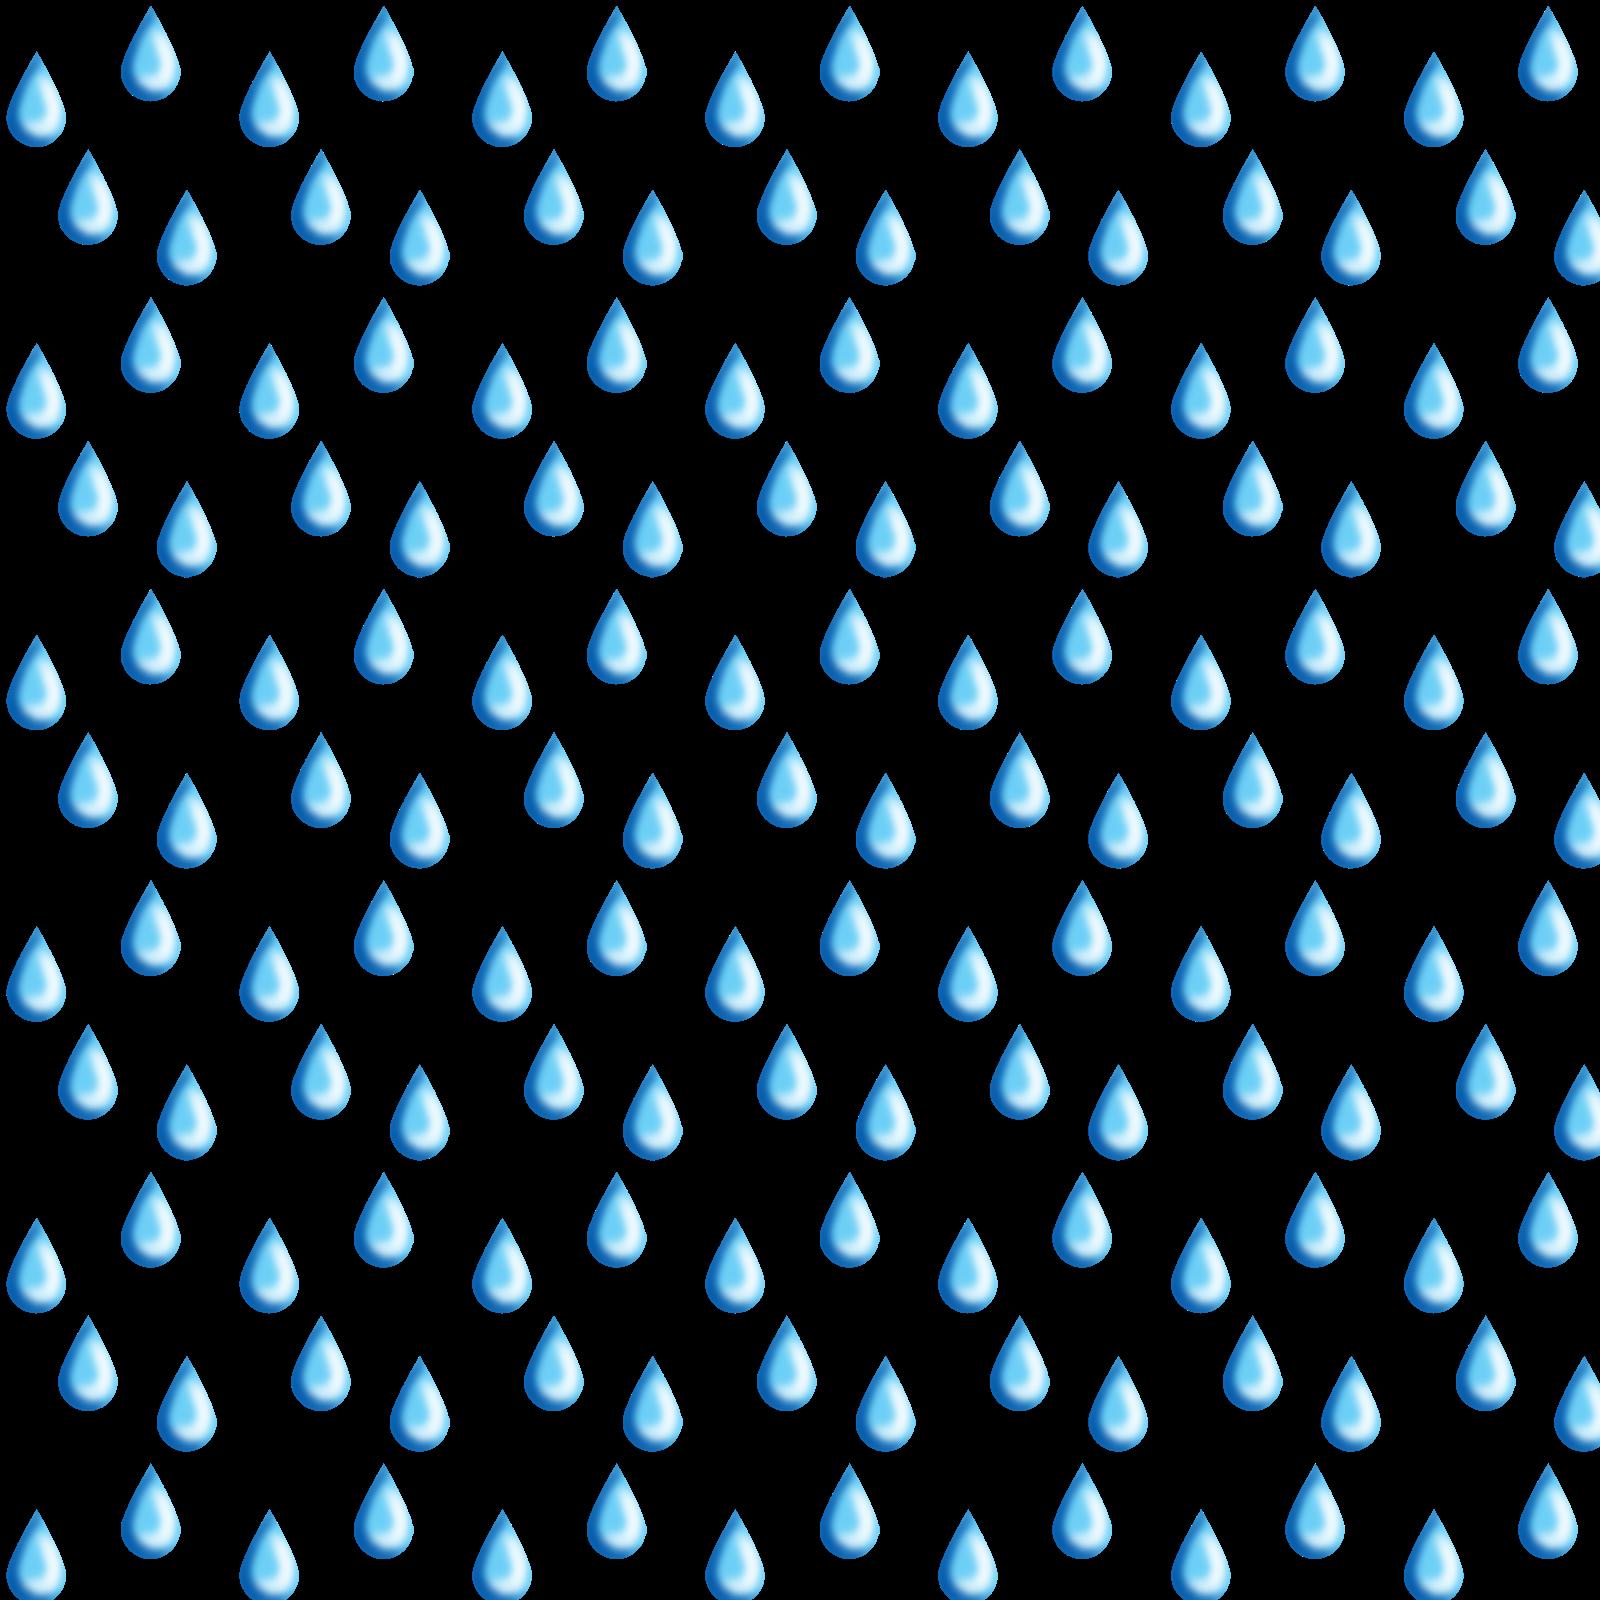 Gif animado de agua de mar imagui for Fondos animados de agua